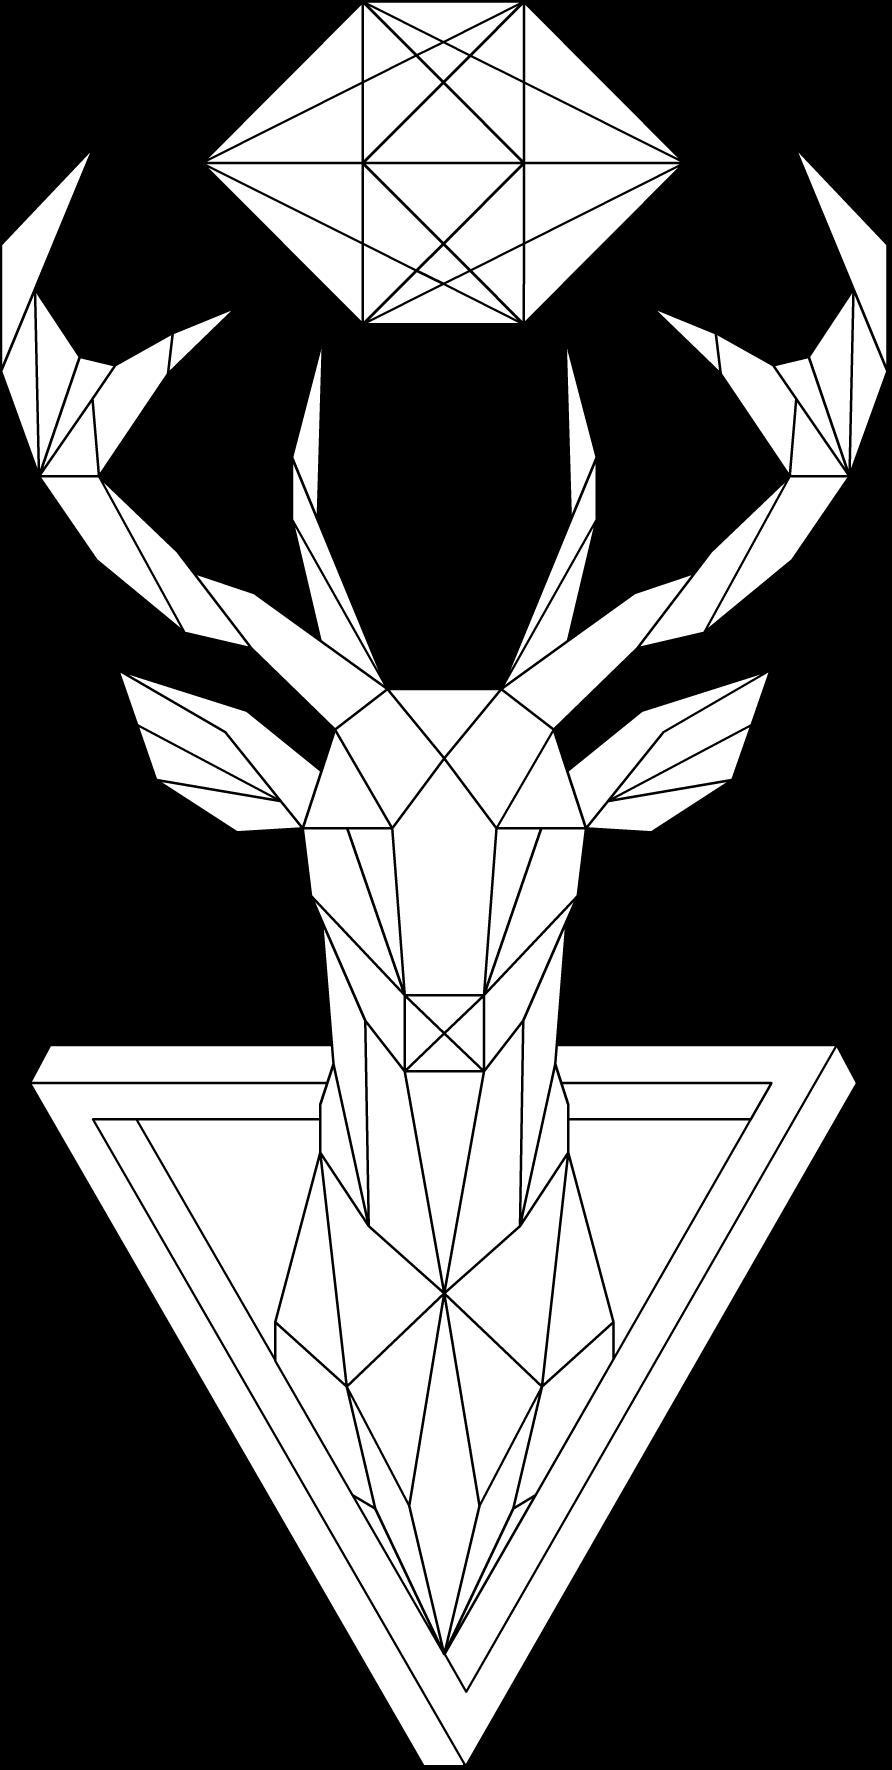 Geometric Deer 2 By Mrdrawing On Deviantart Taslaklar En